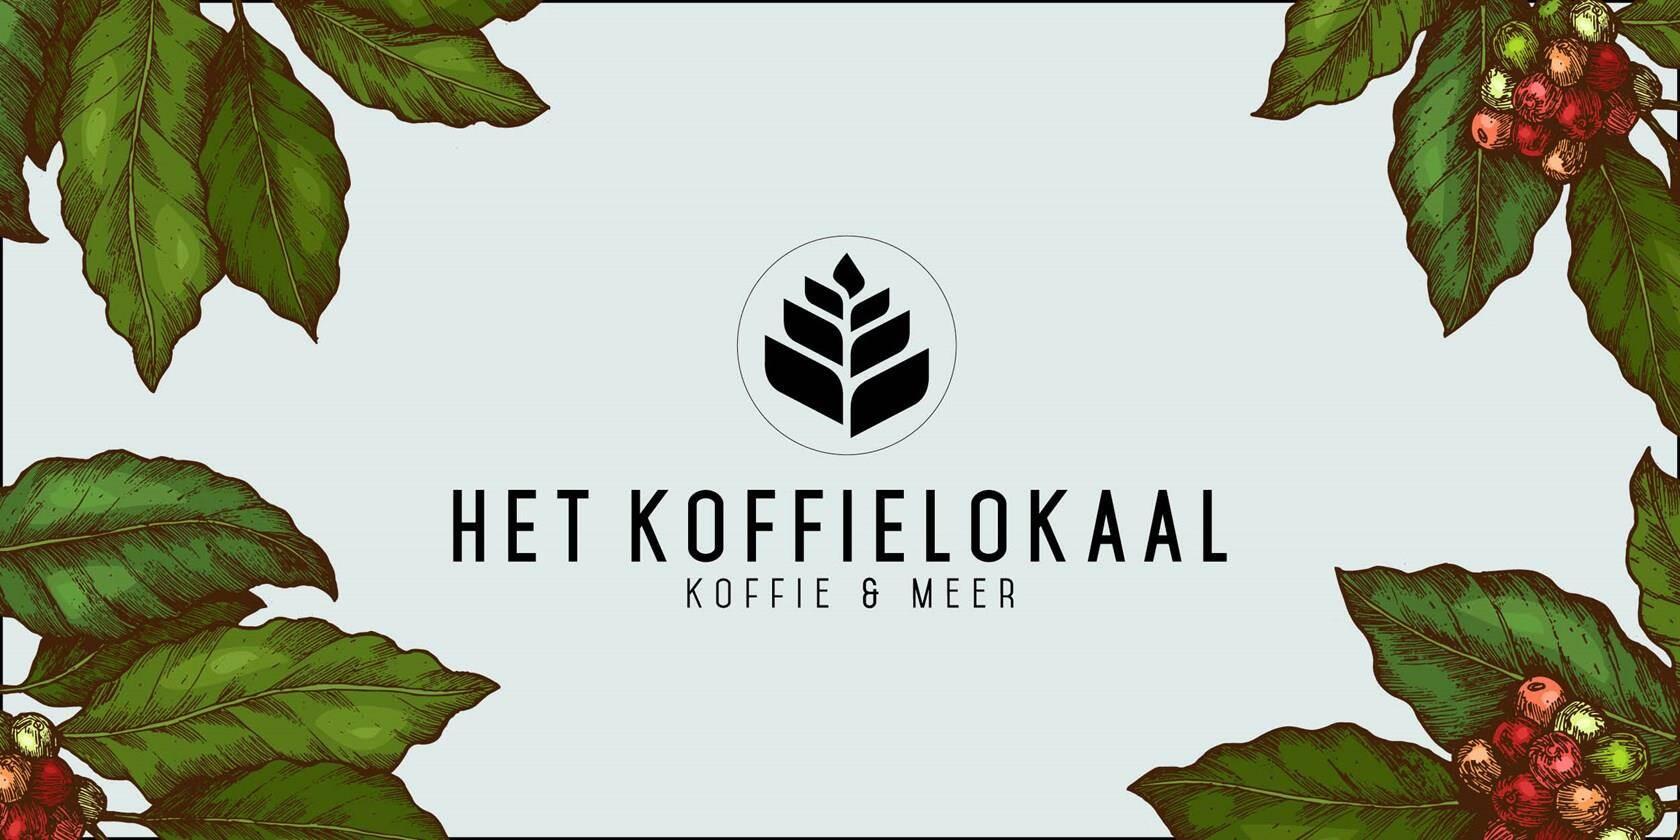 Het Koffielokaal Hoorn